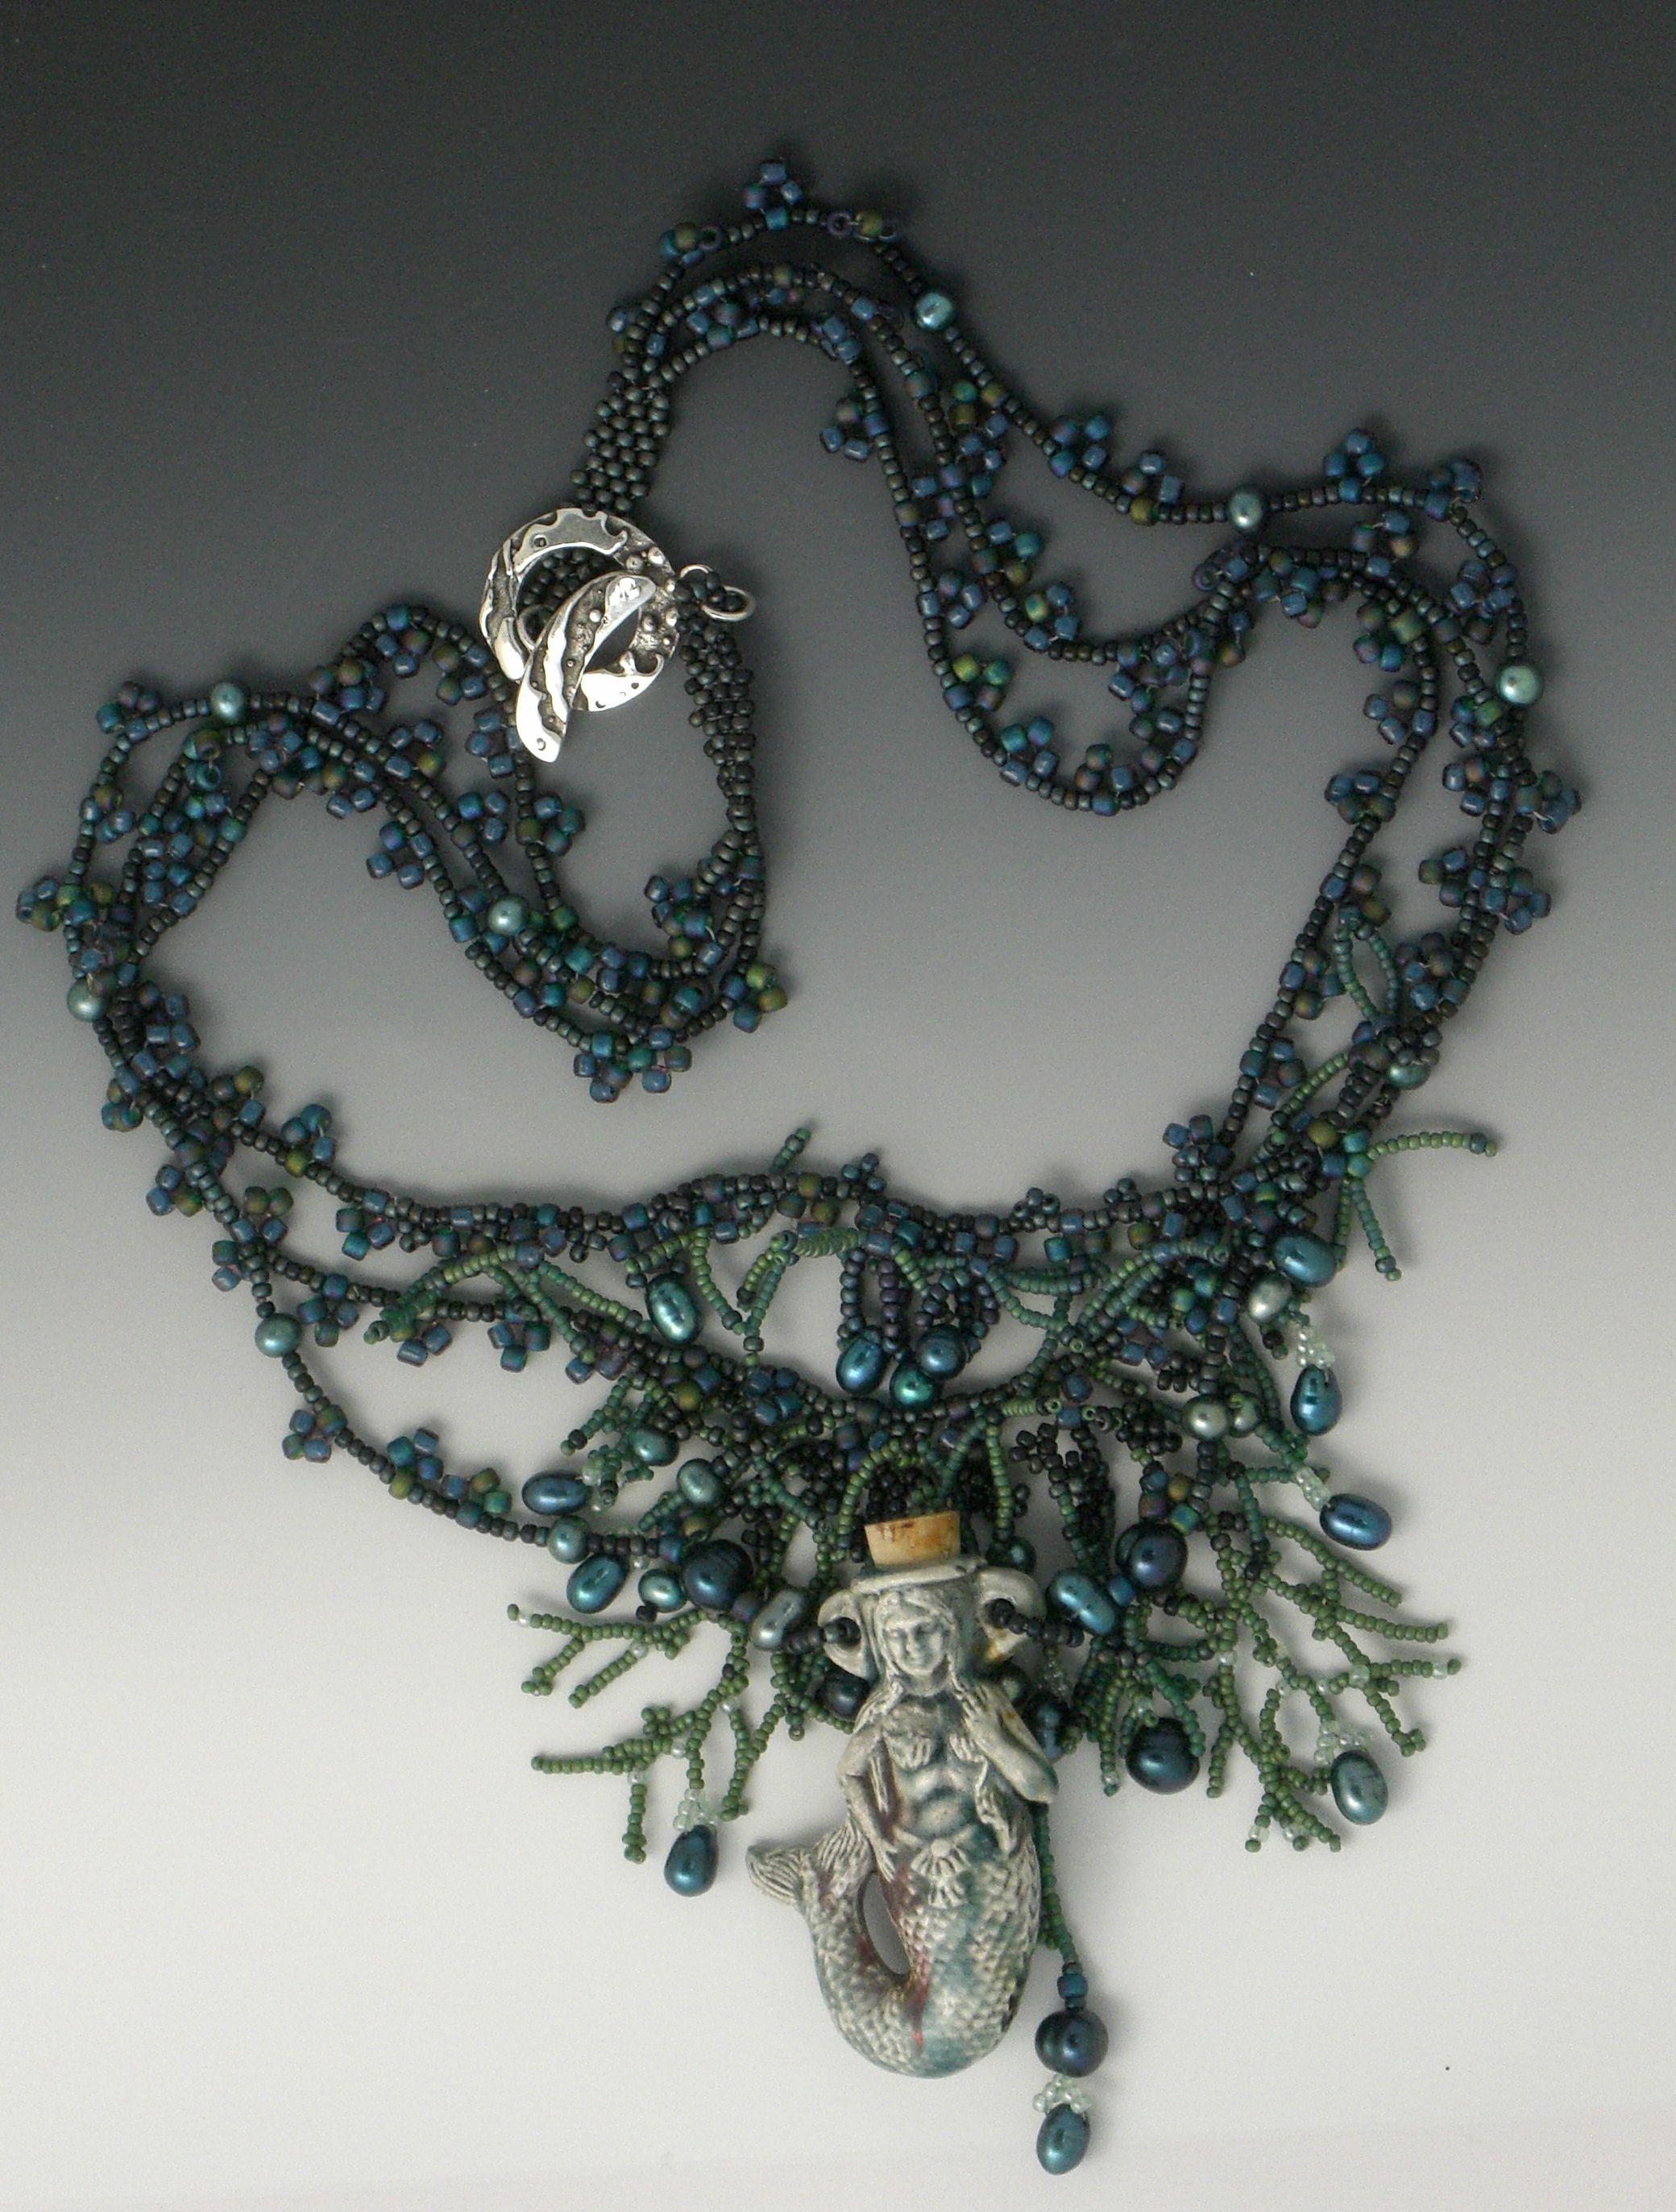 seed bead crafts